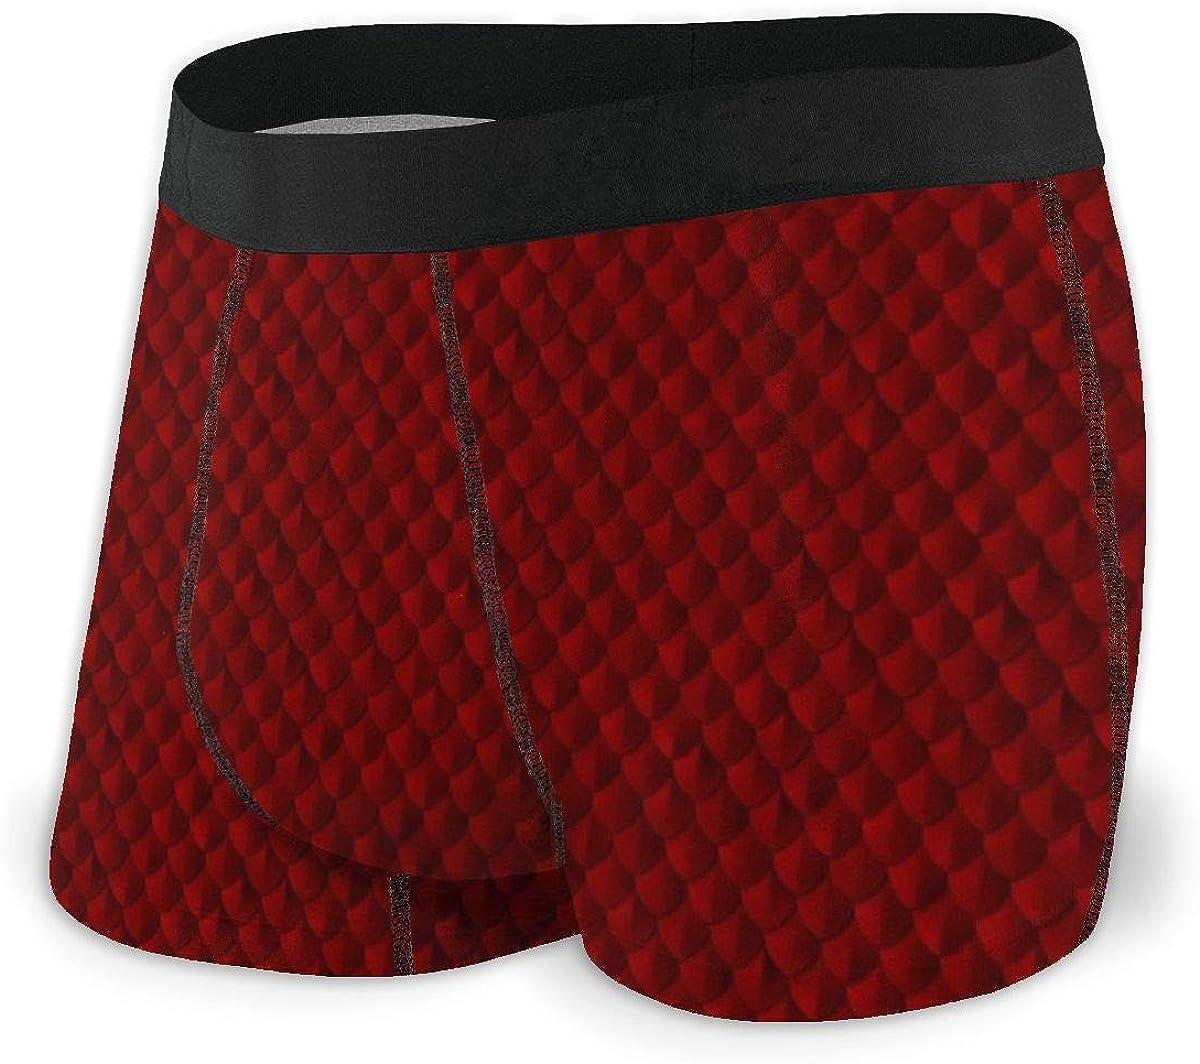 Red Fish Scales Men Regular Leg Boxer Brief Underwear Ride-Up Panties